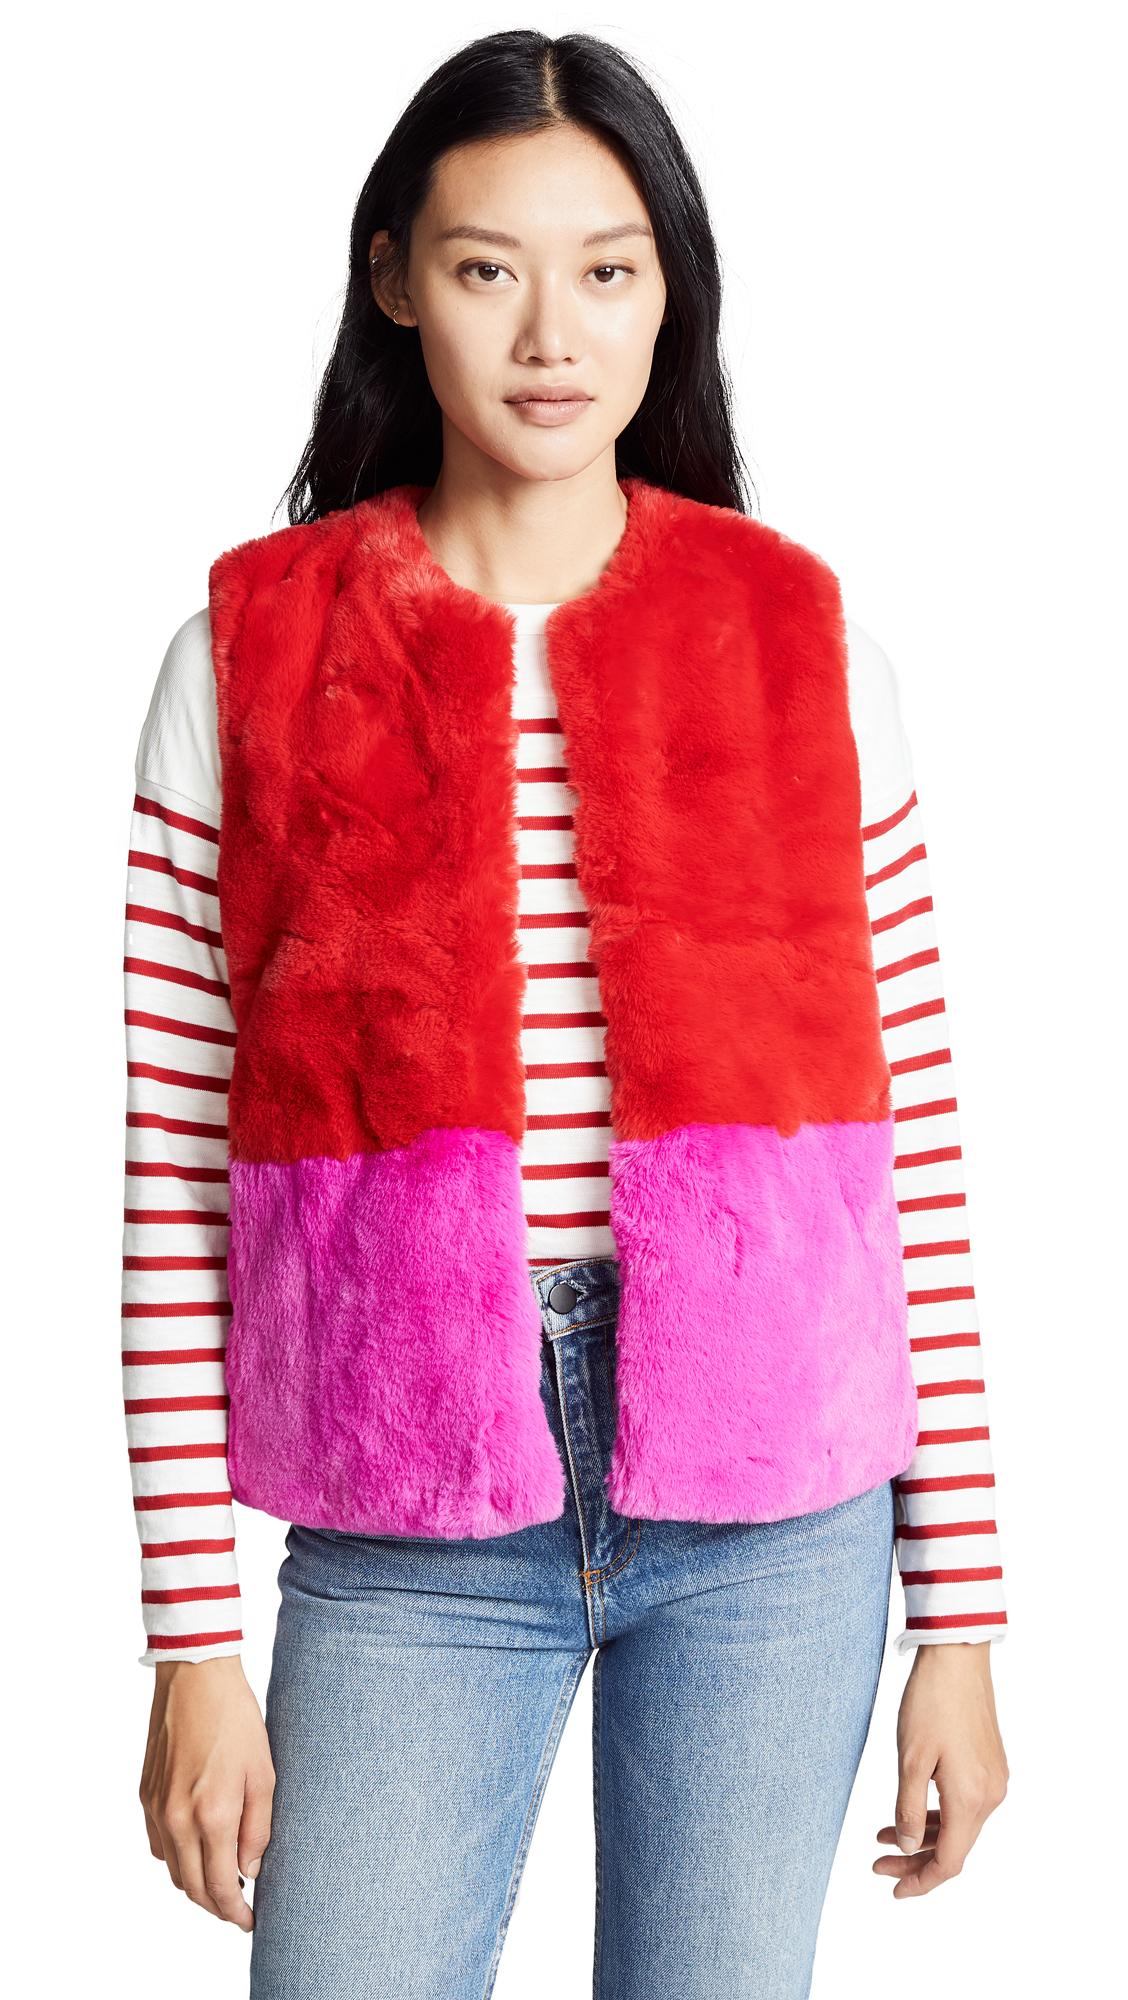 SUNCOO Eva Vest in Red